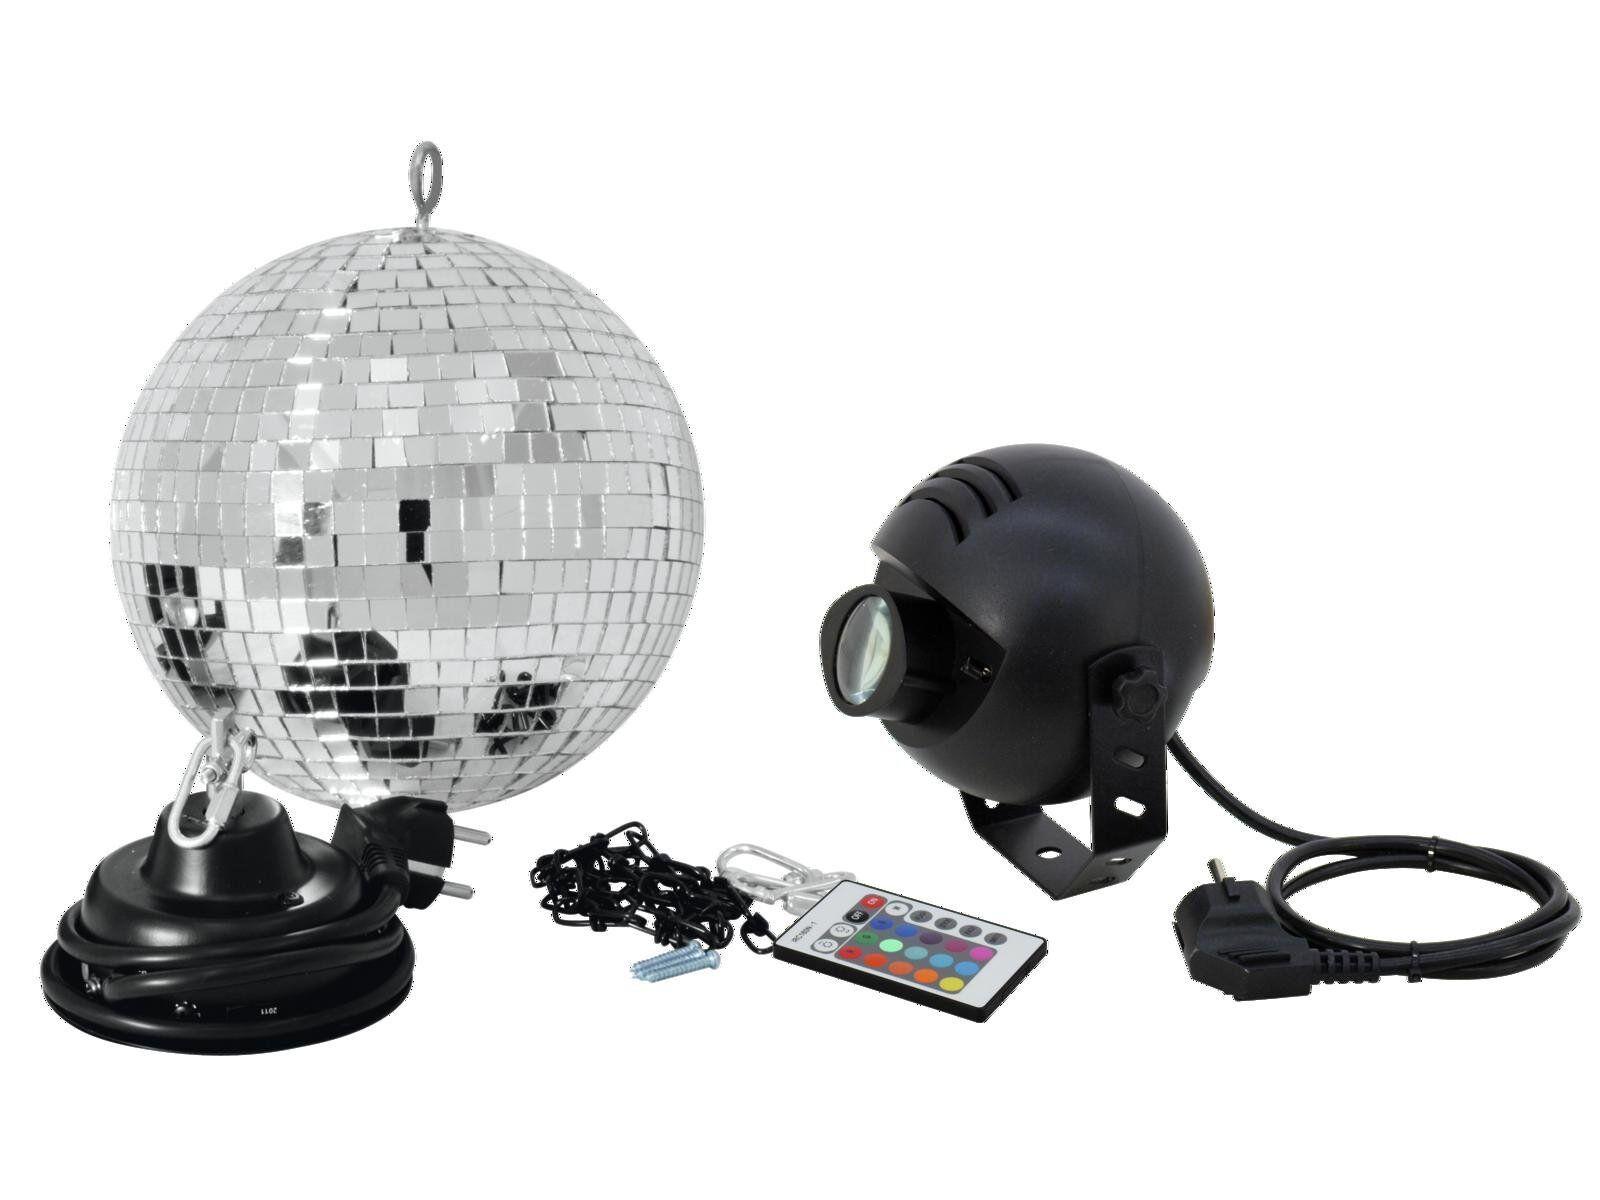 Spiegelkugel Discokugel Mirror Ball Set Party-Paket mit LED RGB Spot PST-9W & FB